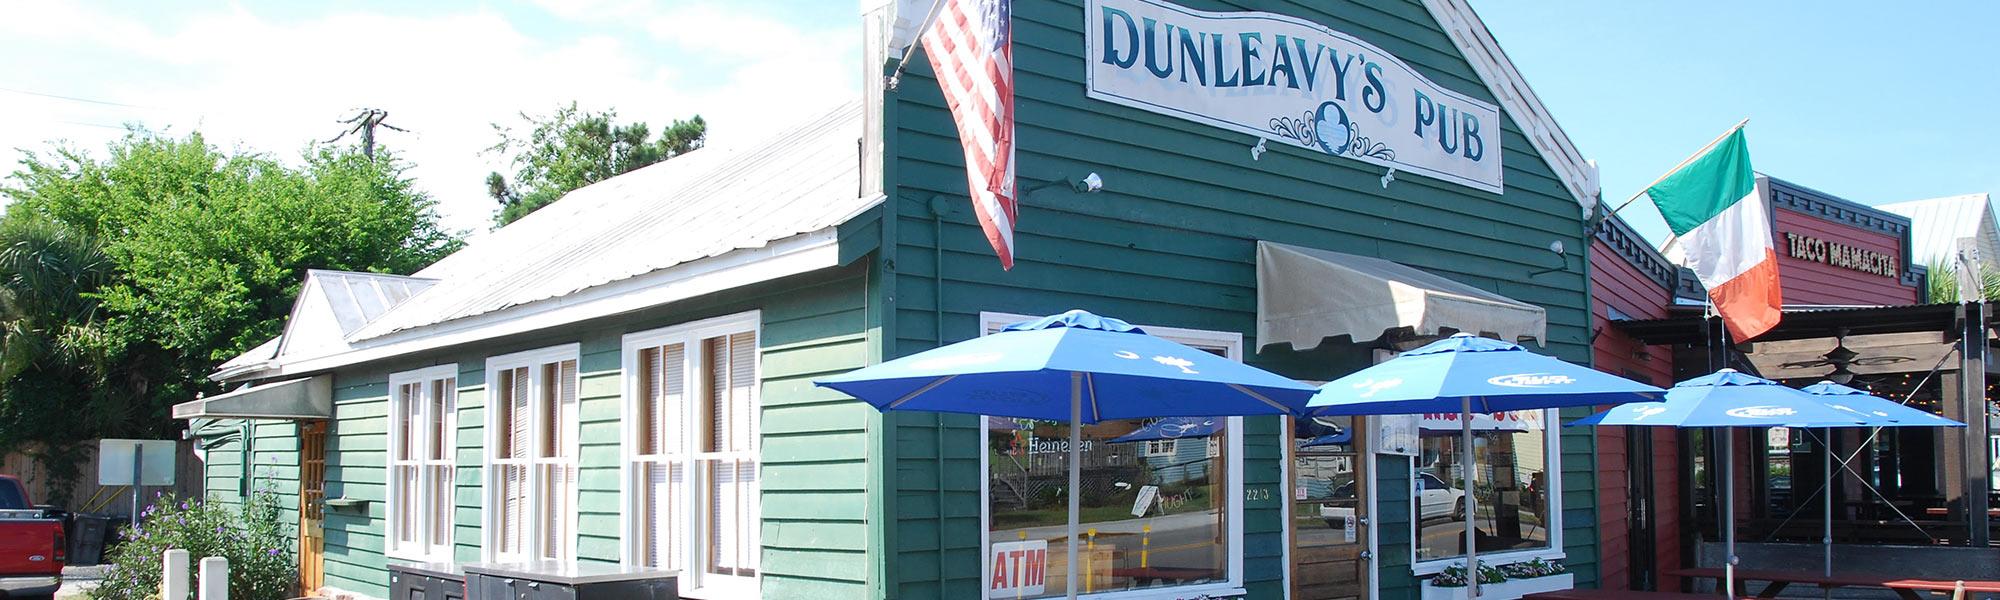 Dunleavy's Pub Home Page Slider 3